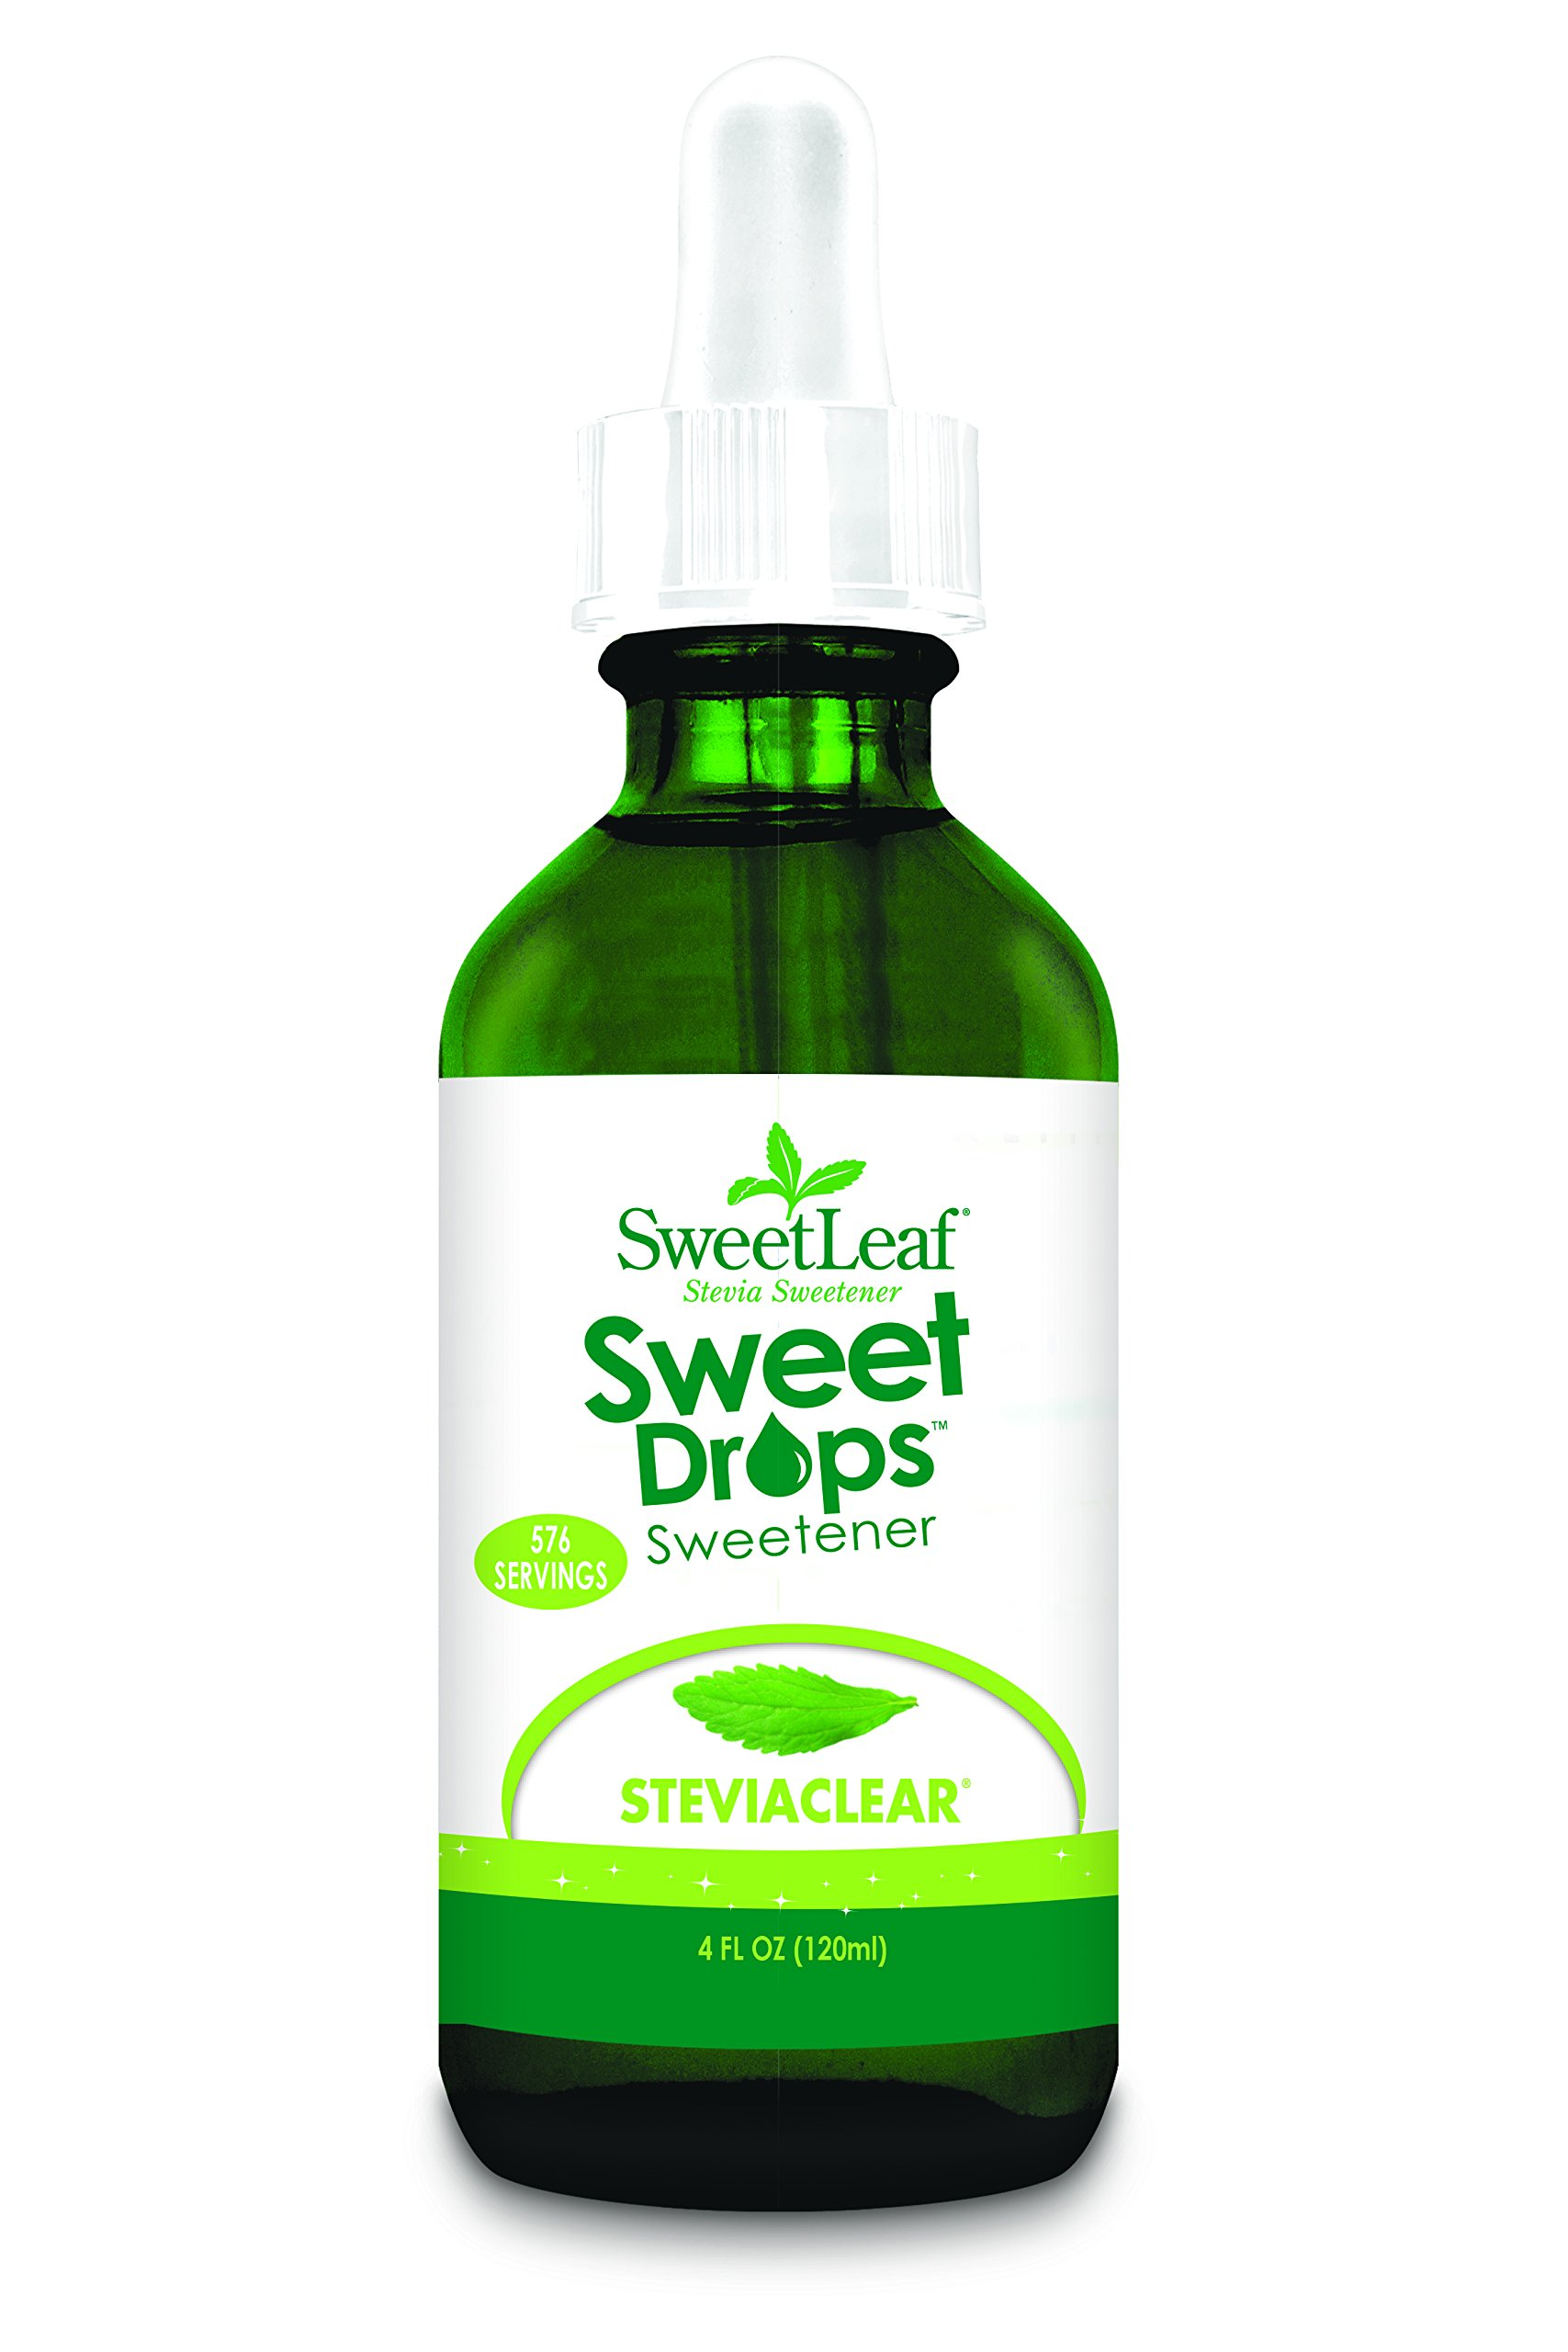 SweetLeaf Sweet Drops Liquid Stevia Sweetener, SteviaClear, 4 Ounce (Pack of 2) by SweetLeaf (Image #2)